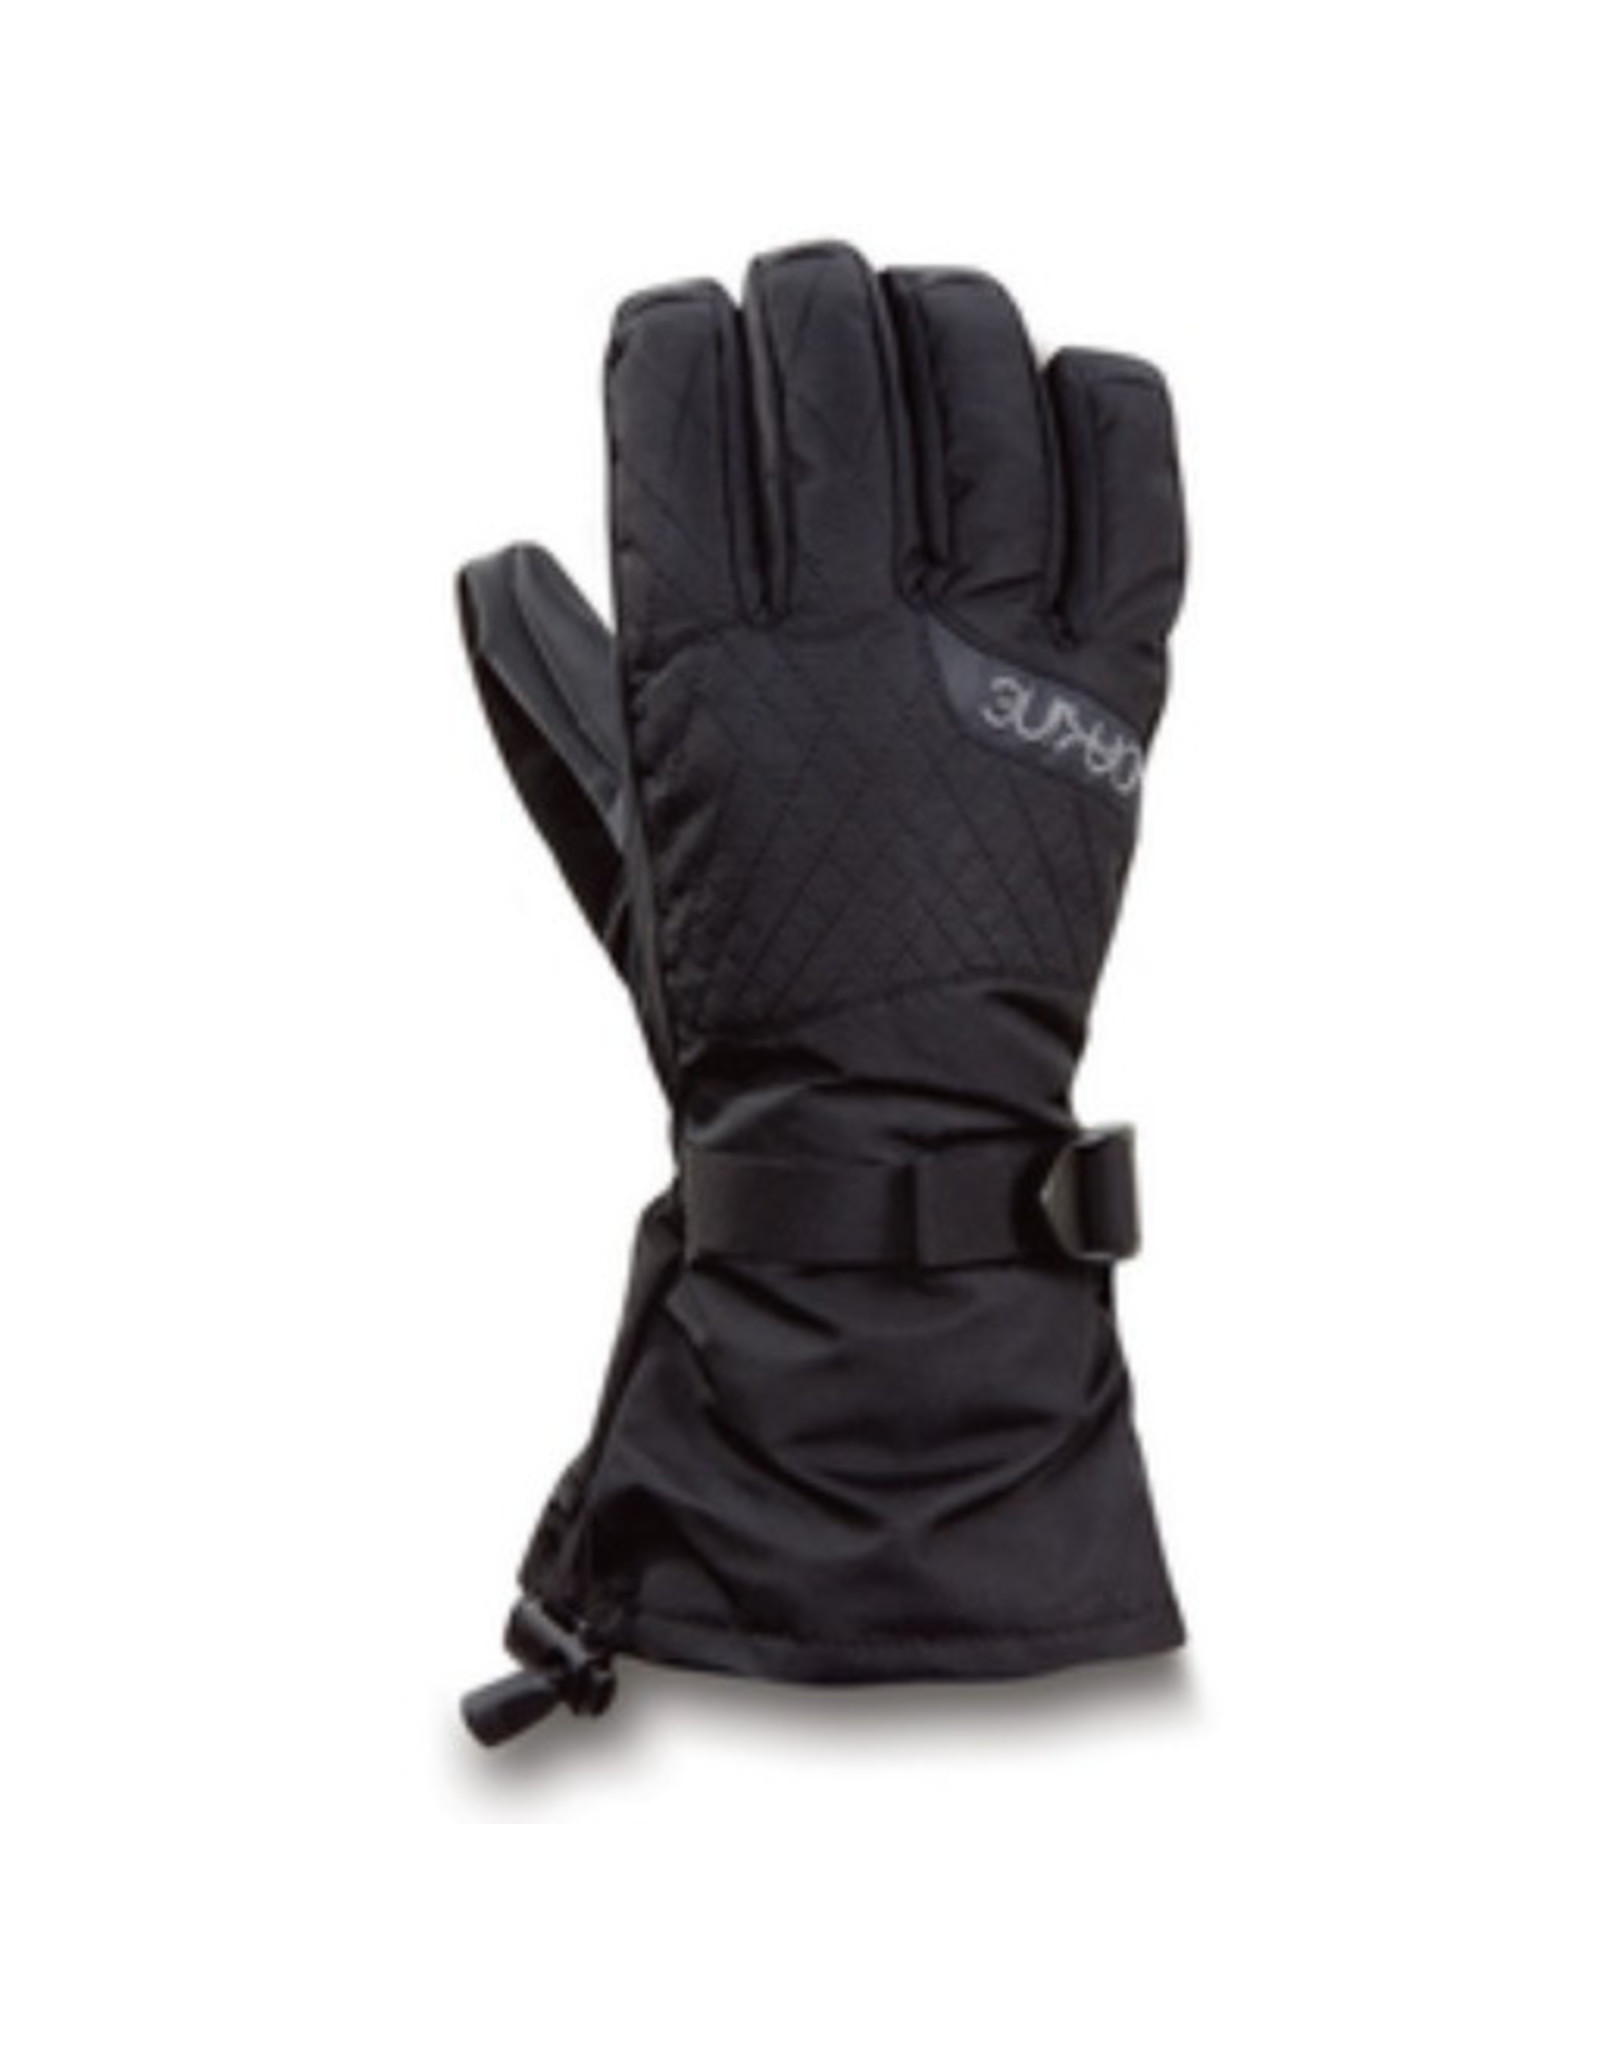 Dakine Dakine - Camino - M - Black - Glove